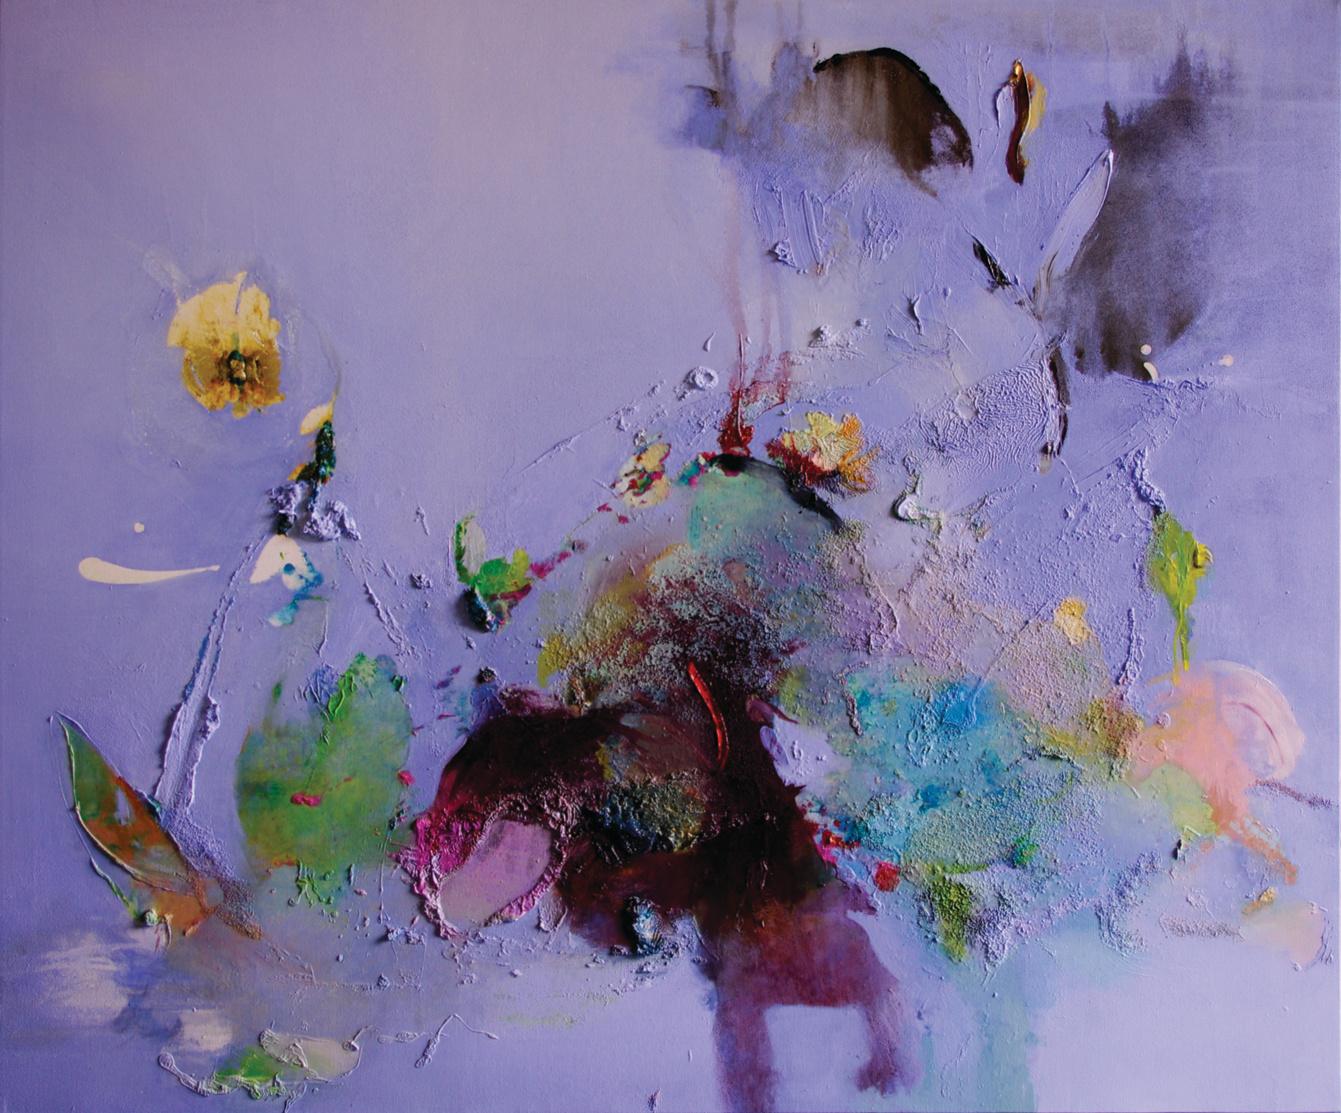 2013-1.120x100 cm.oil on canvas